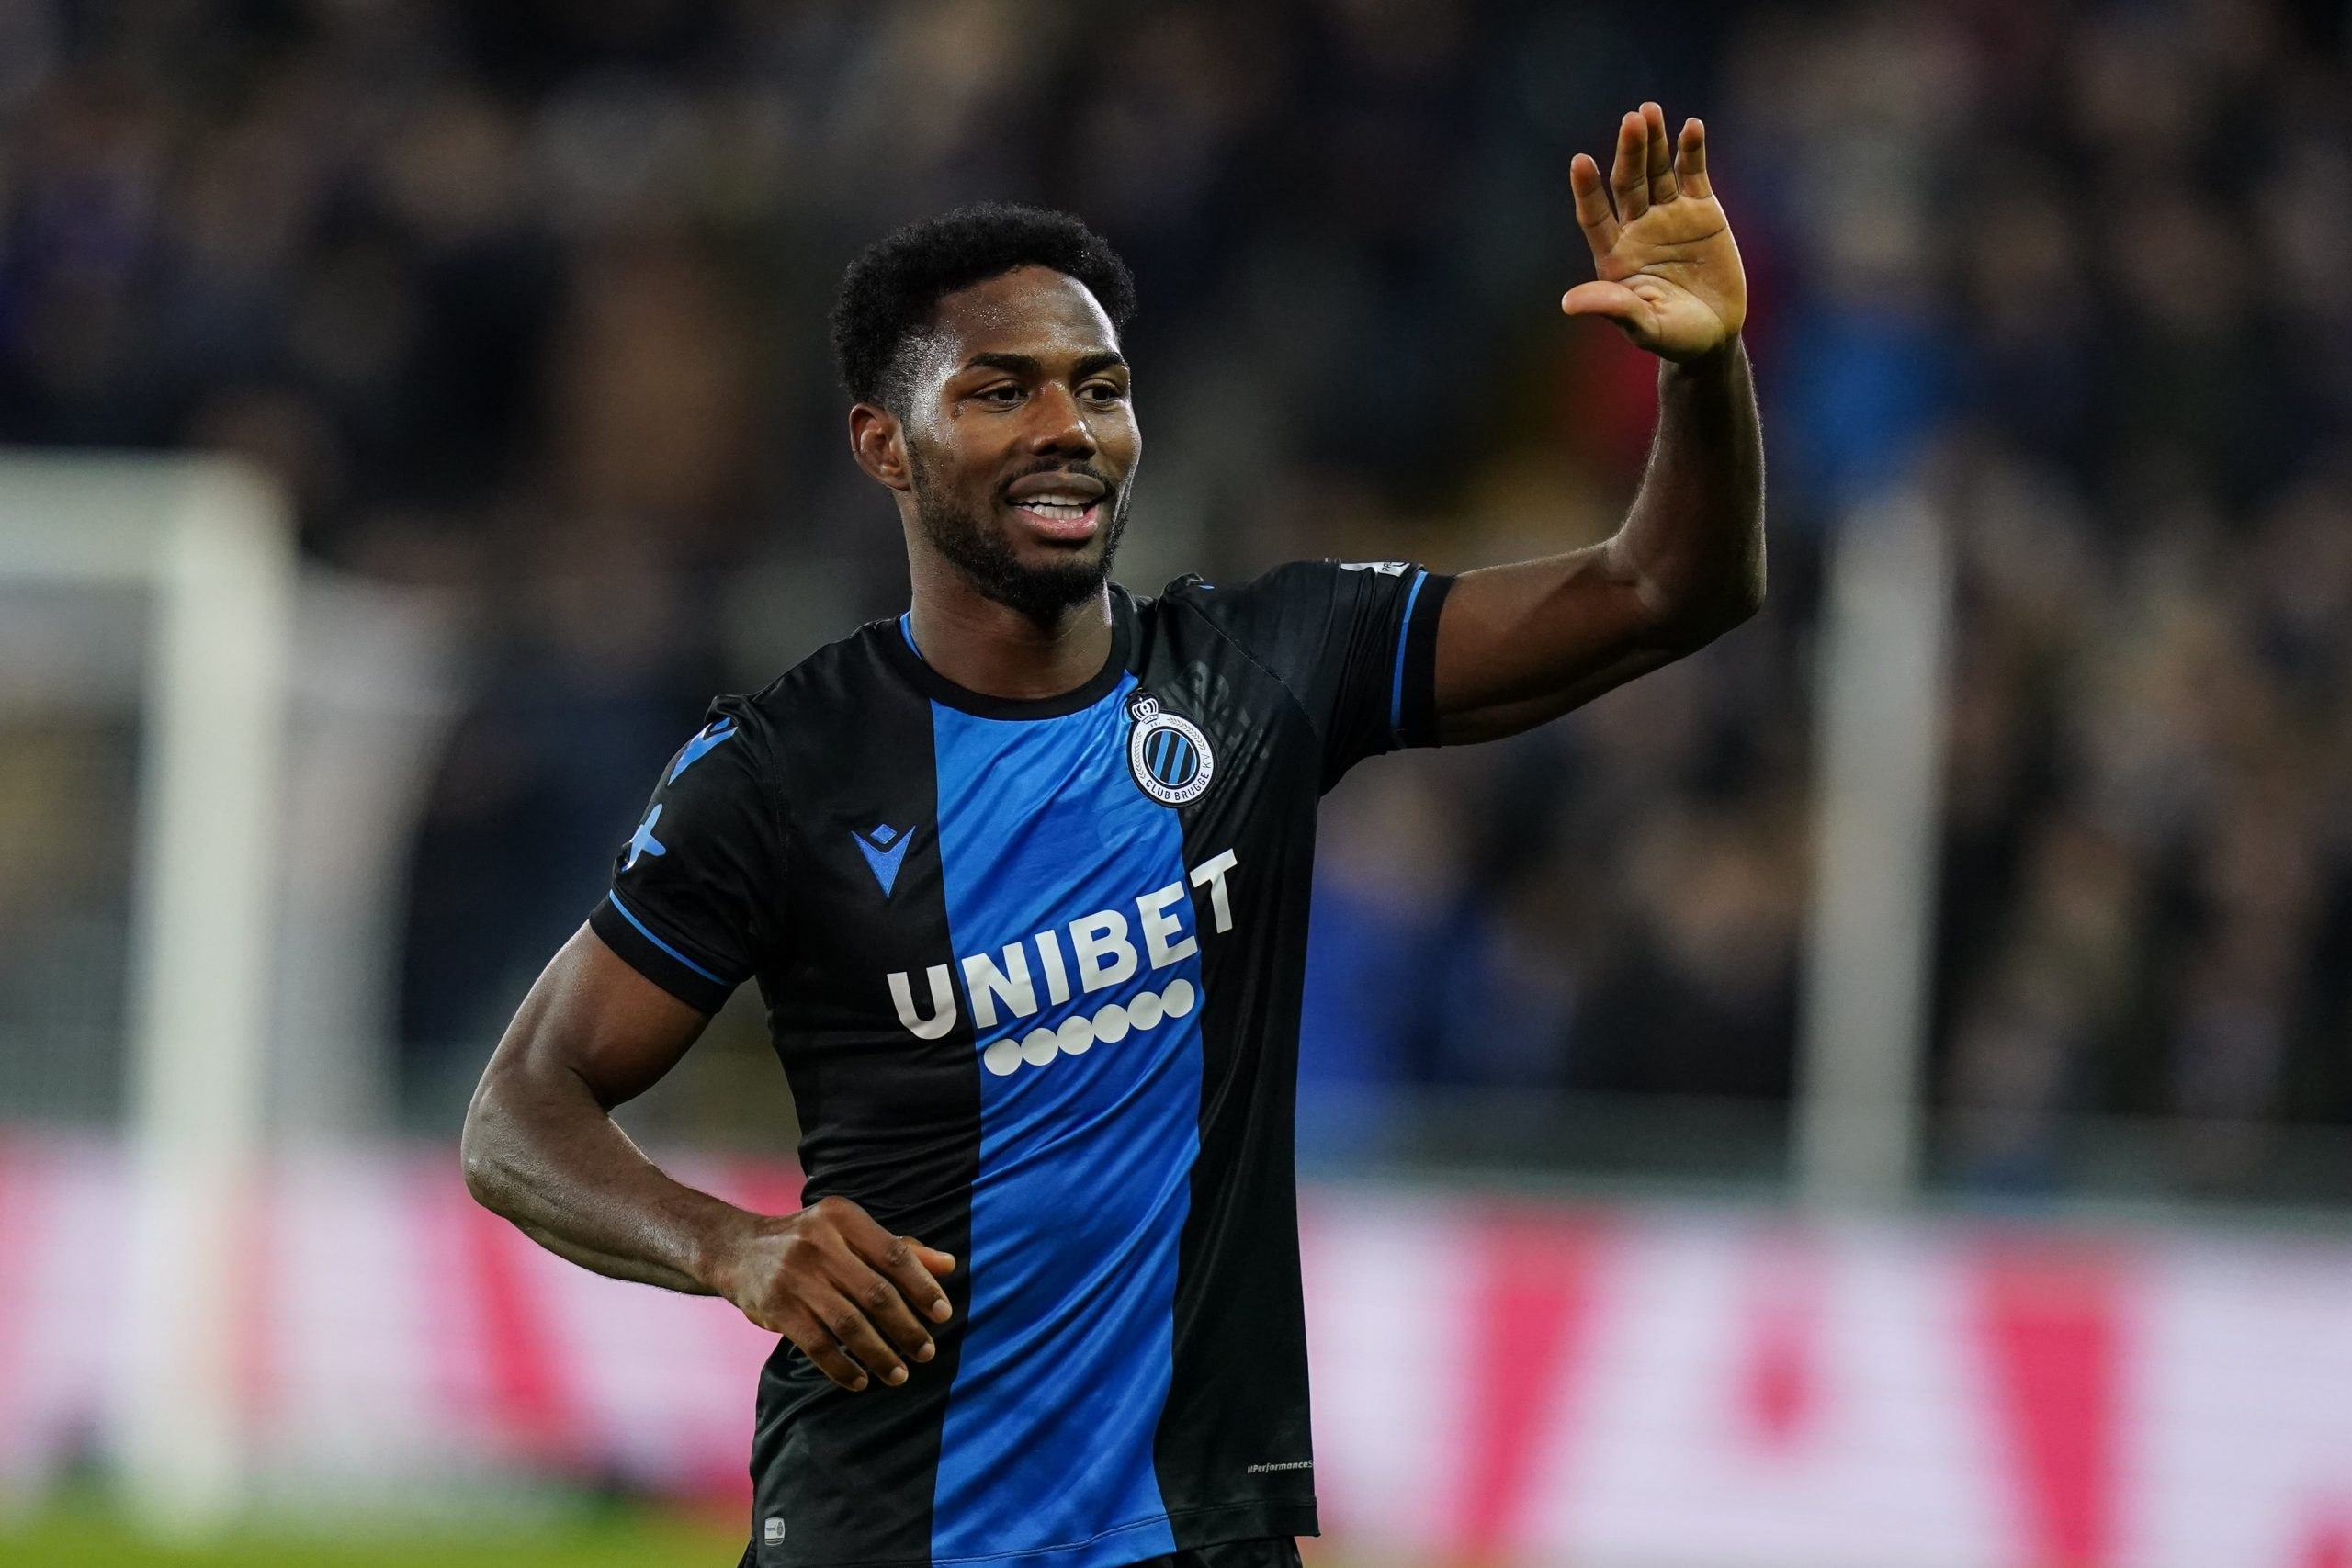 Dennis, Okereke Win Belgian League Title With Club Brugge